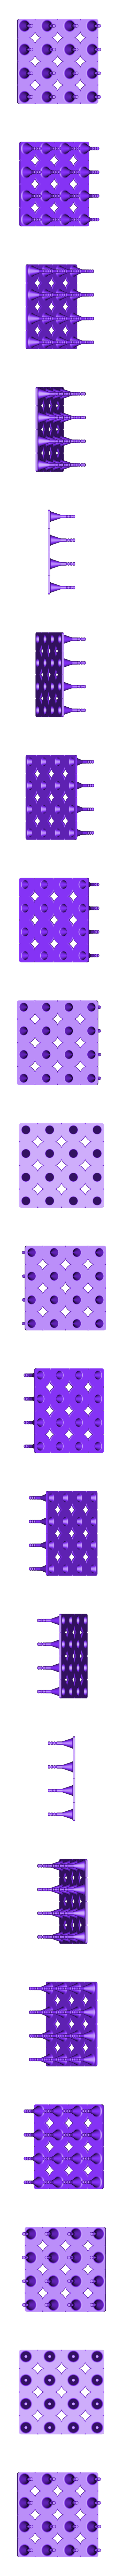 GeoBoard4x4_A.stl Download free STL file Geoboard, Geometric Board, Cartesian, Isometic, Circular, Geometry, Math • 3D printer object, LGBU